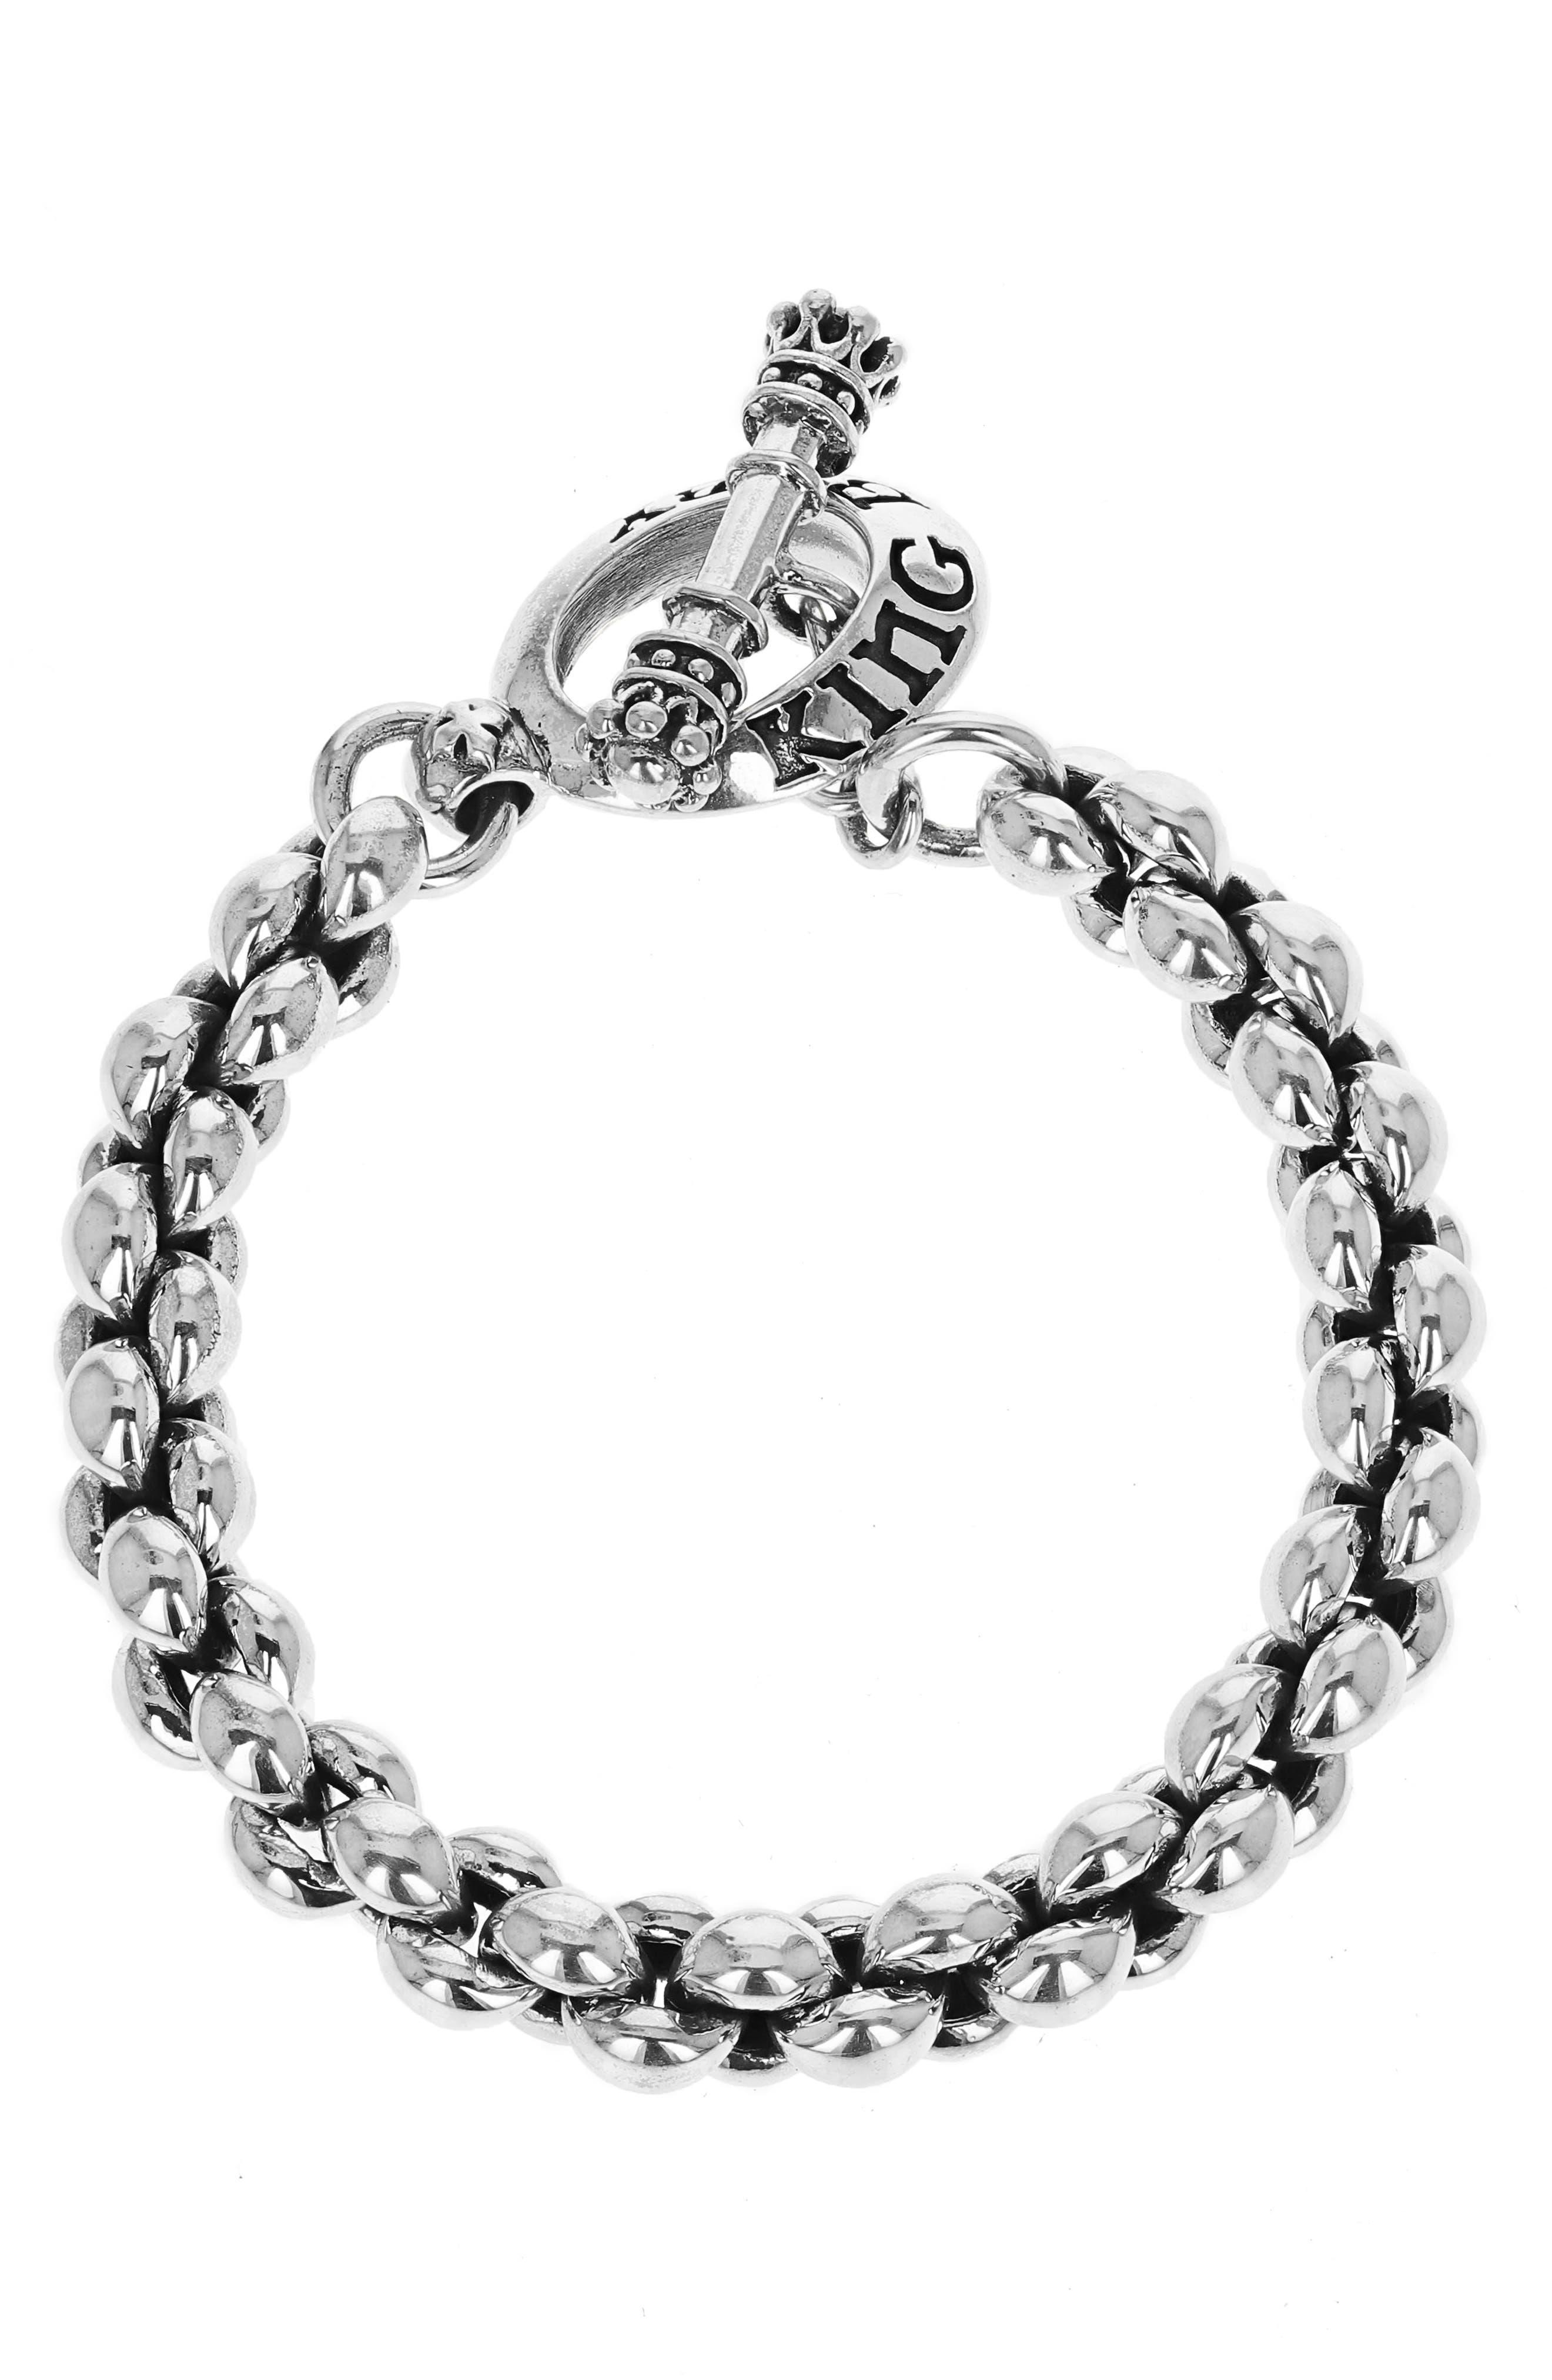 Large Infinity Link Bracelet